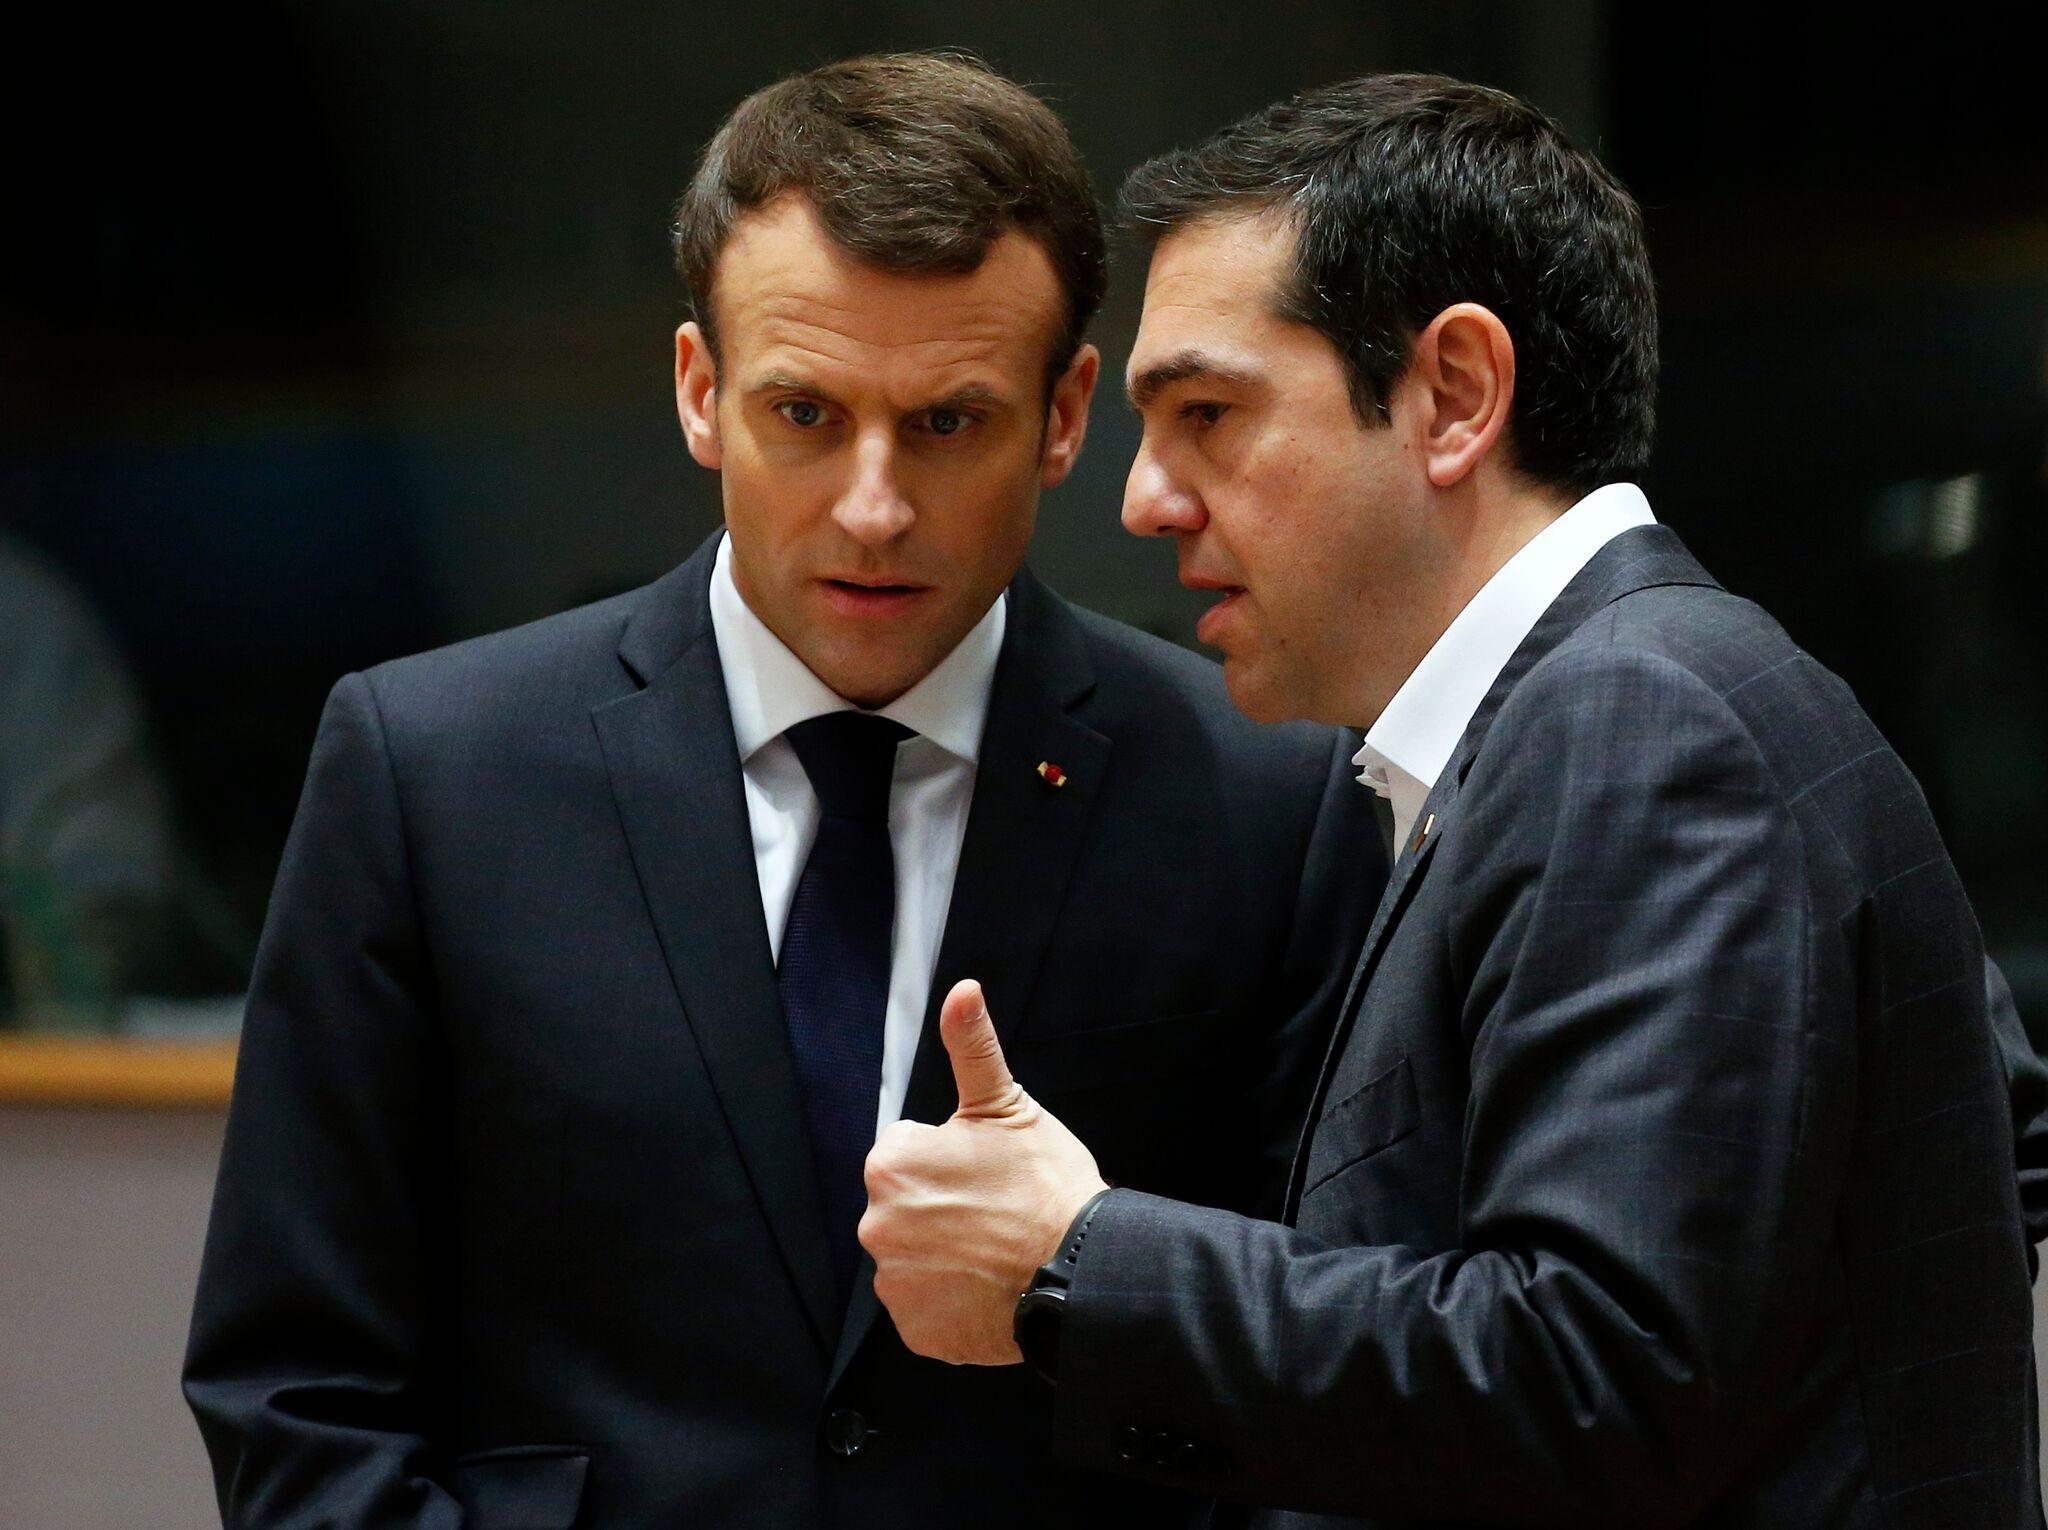 https://www.e-dromos.gr/wp-content/uploads/2019/02/tsipras-macron.jpg